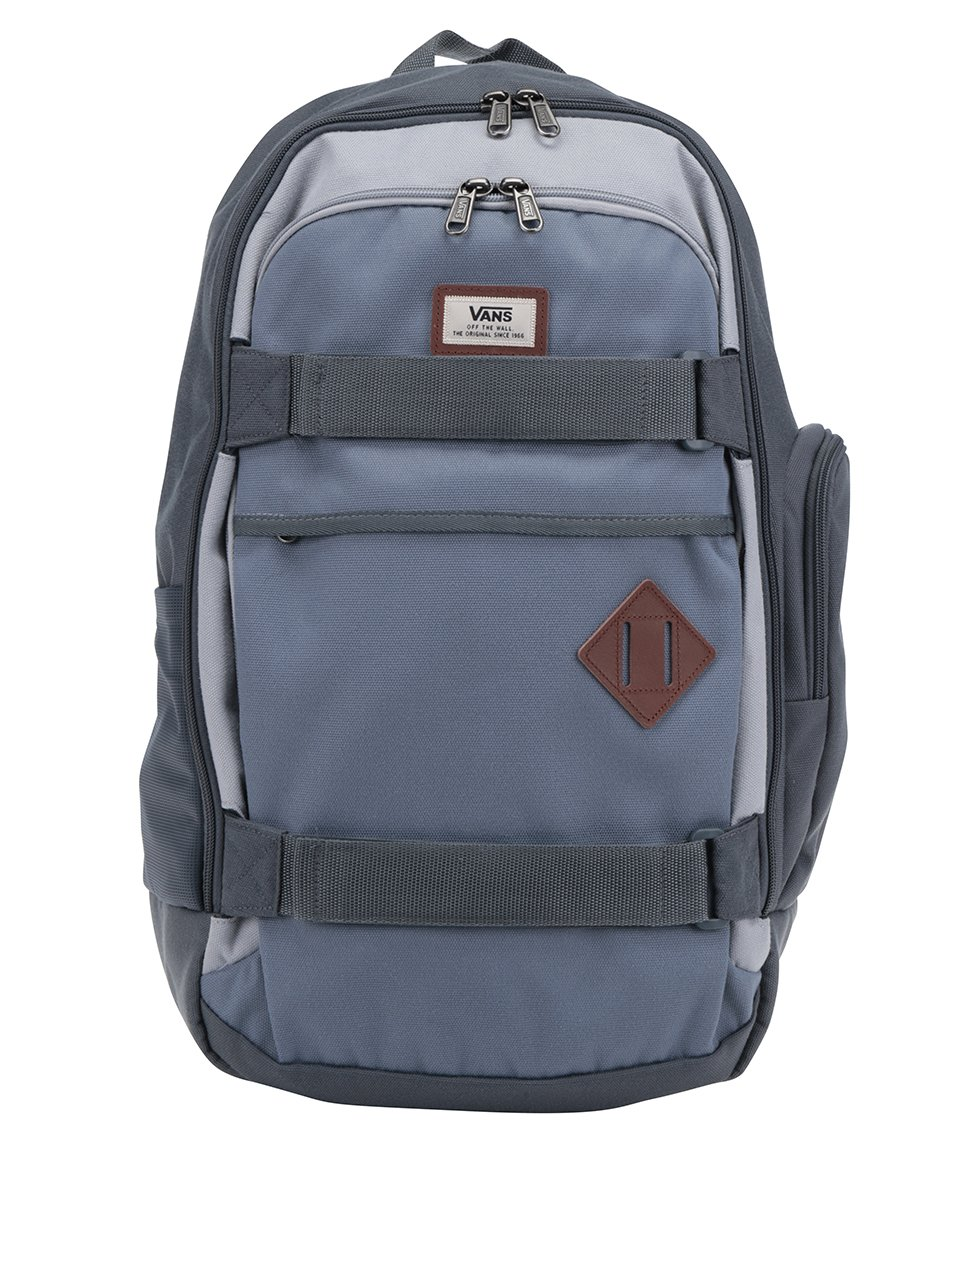 Modro-šedý pánský batoh Vans 32 l